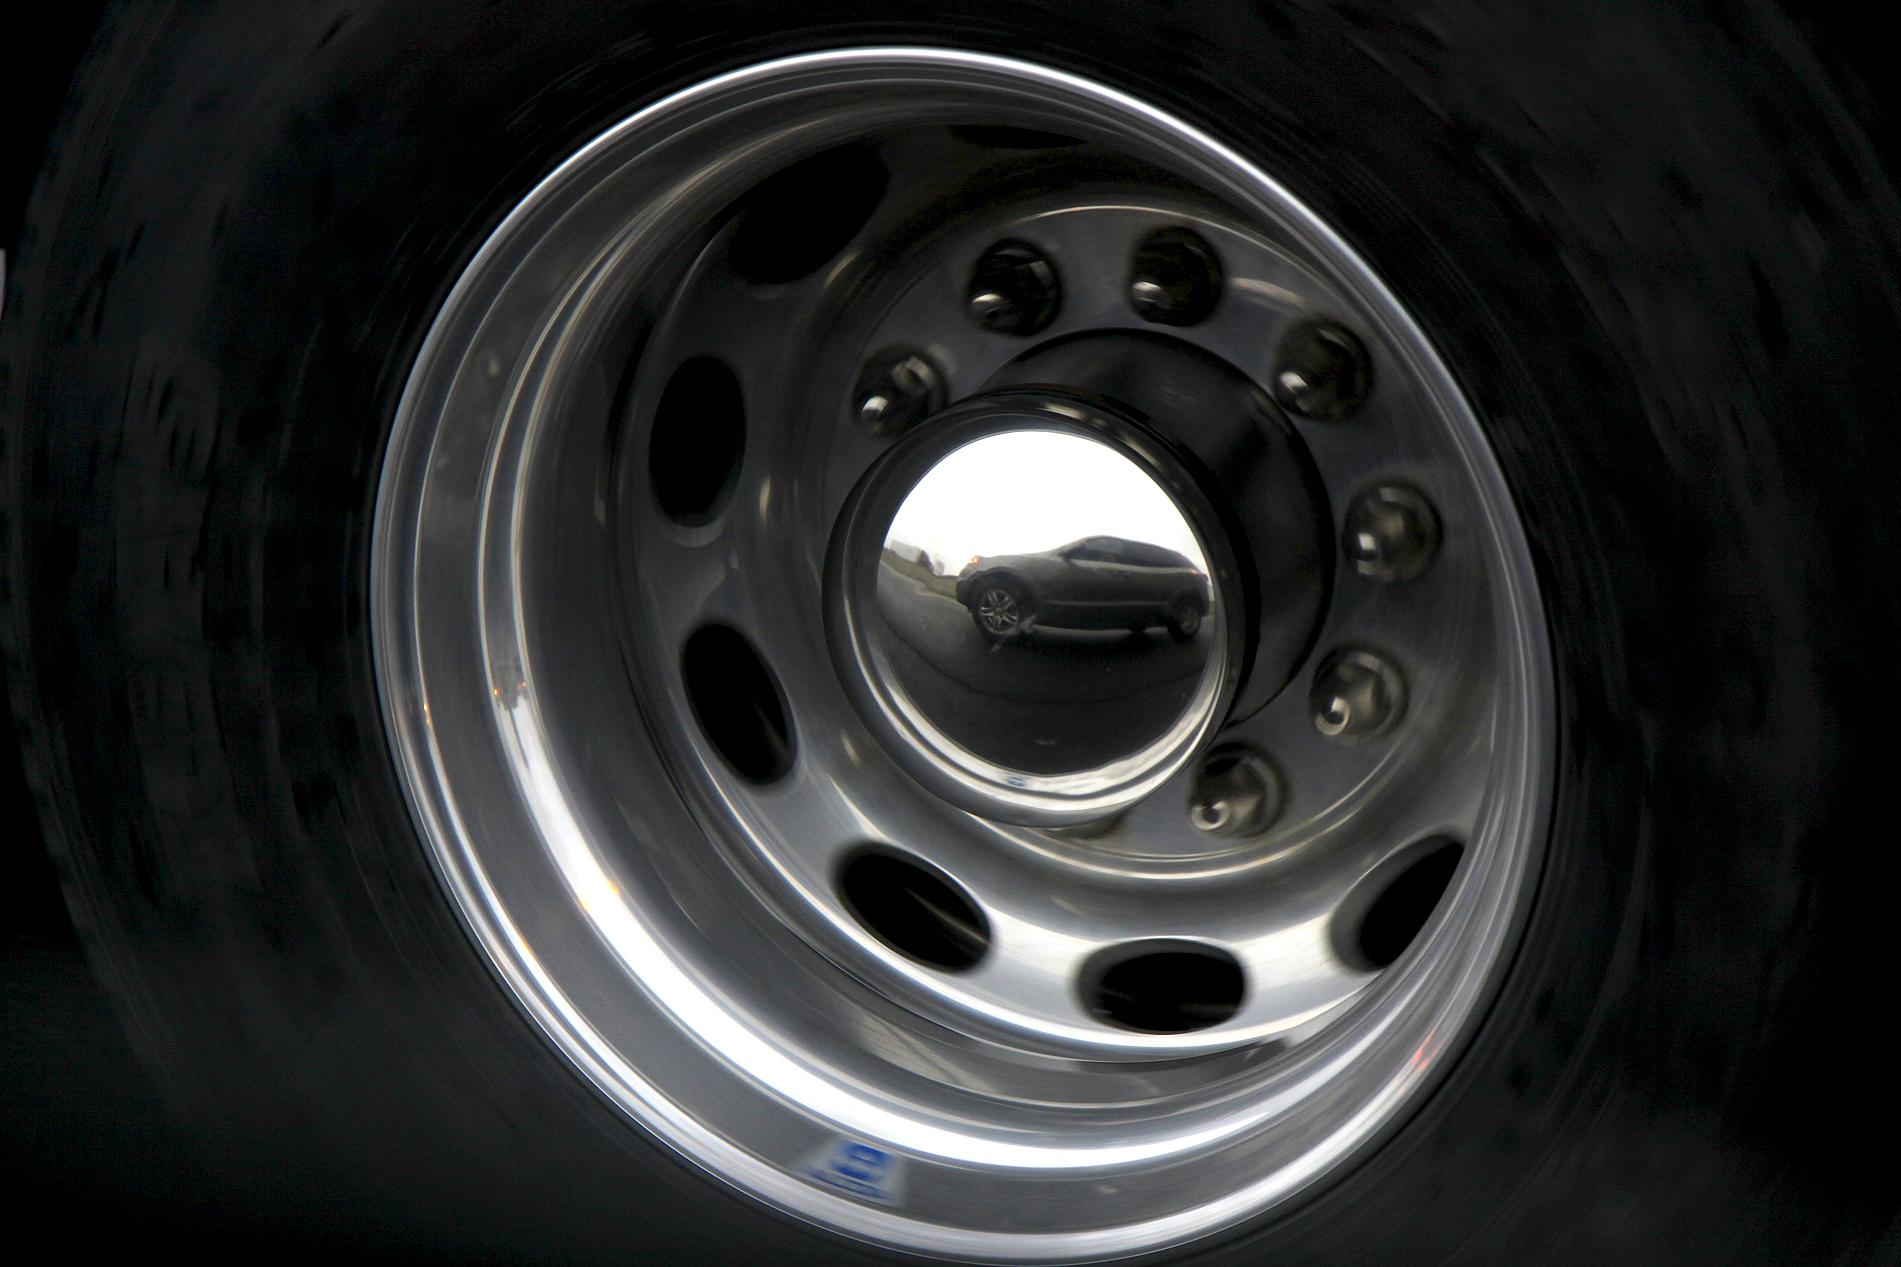 hubcap reflectin